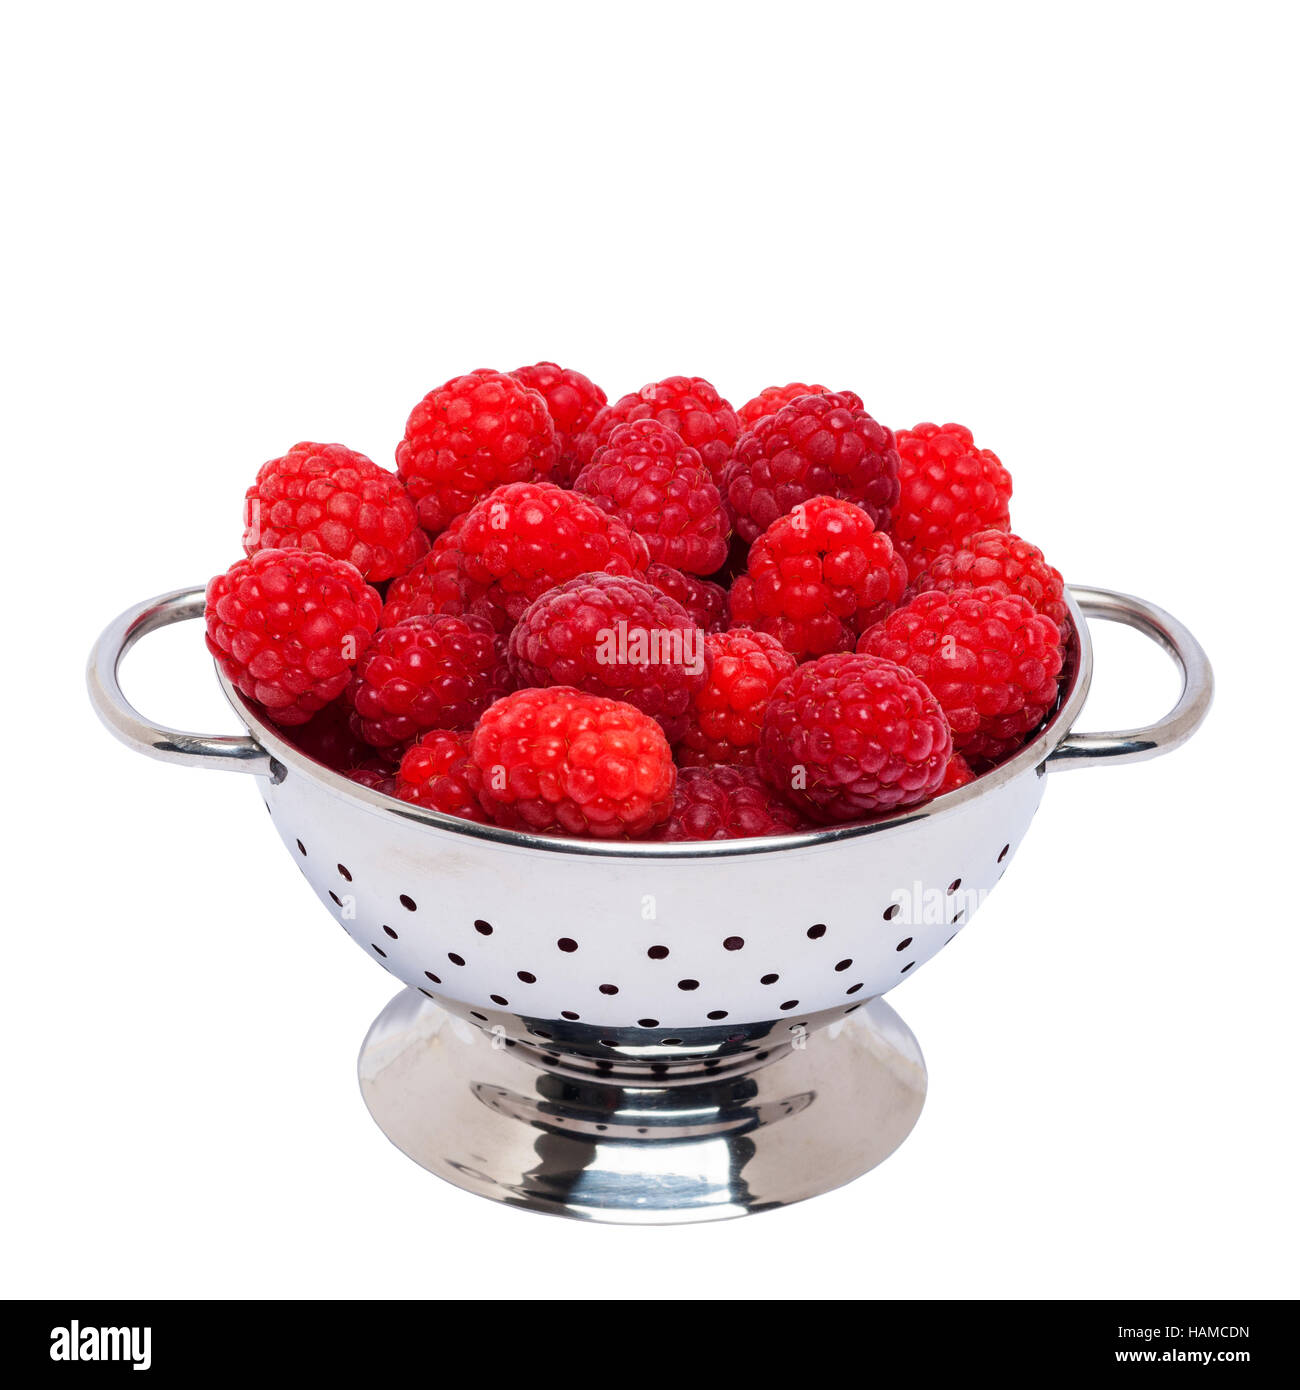 Fresh raspberries on a white background - Stock Image